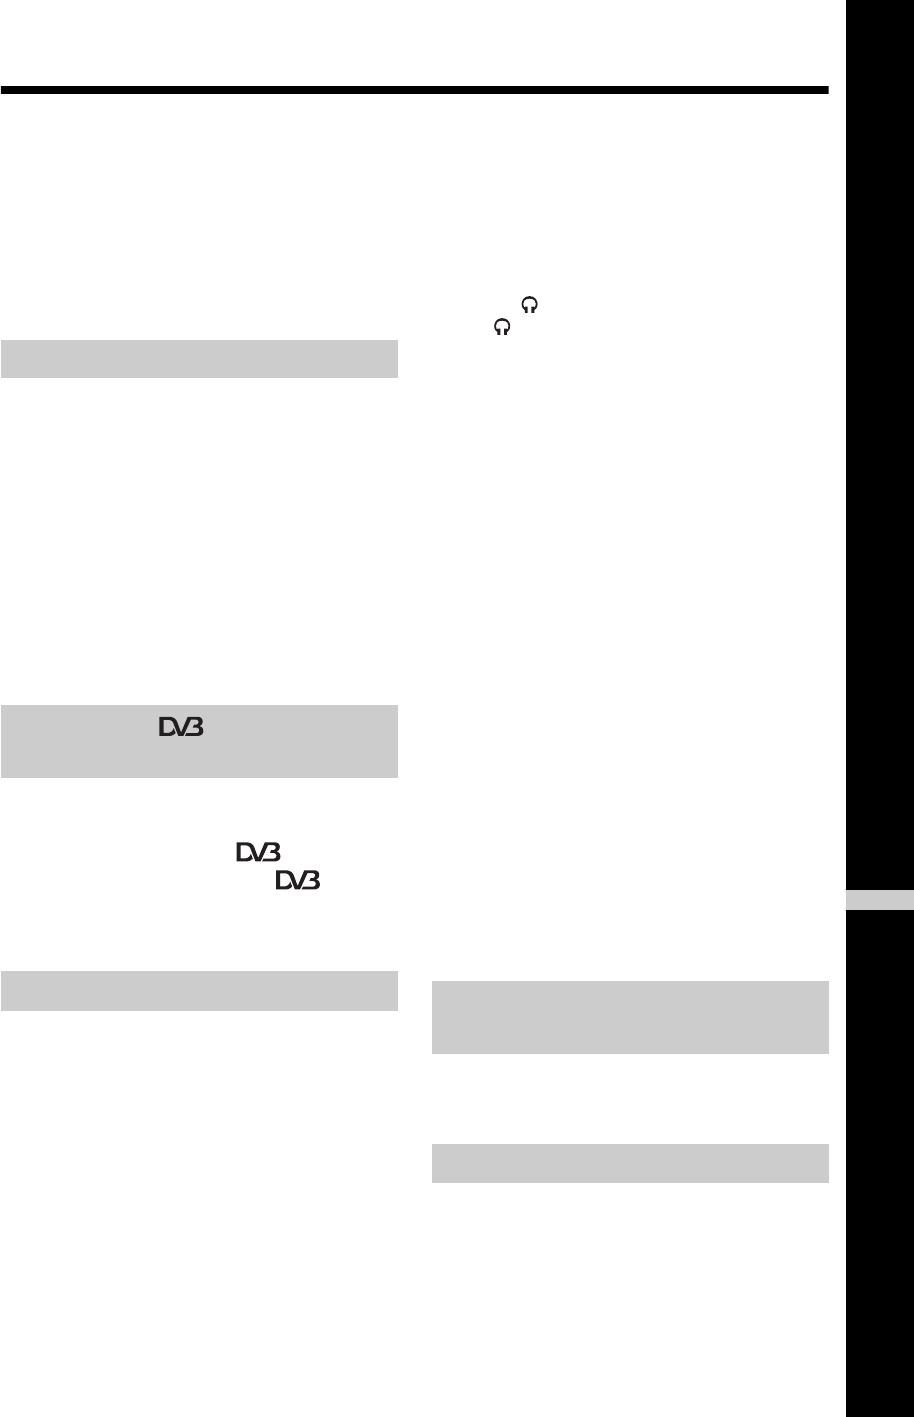 Sony Bravia Kdl W40a11e Users Manual